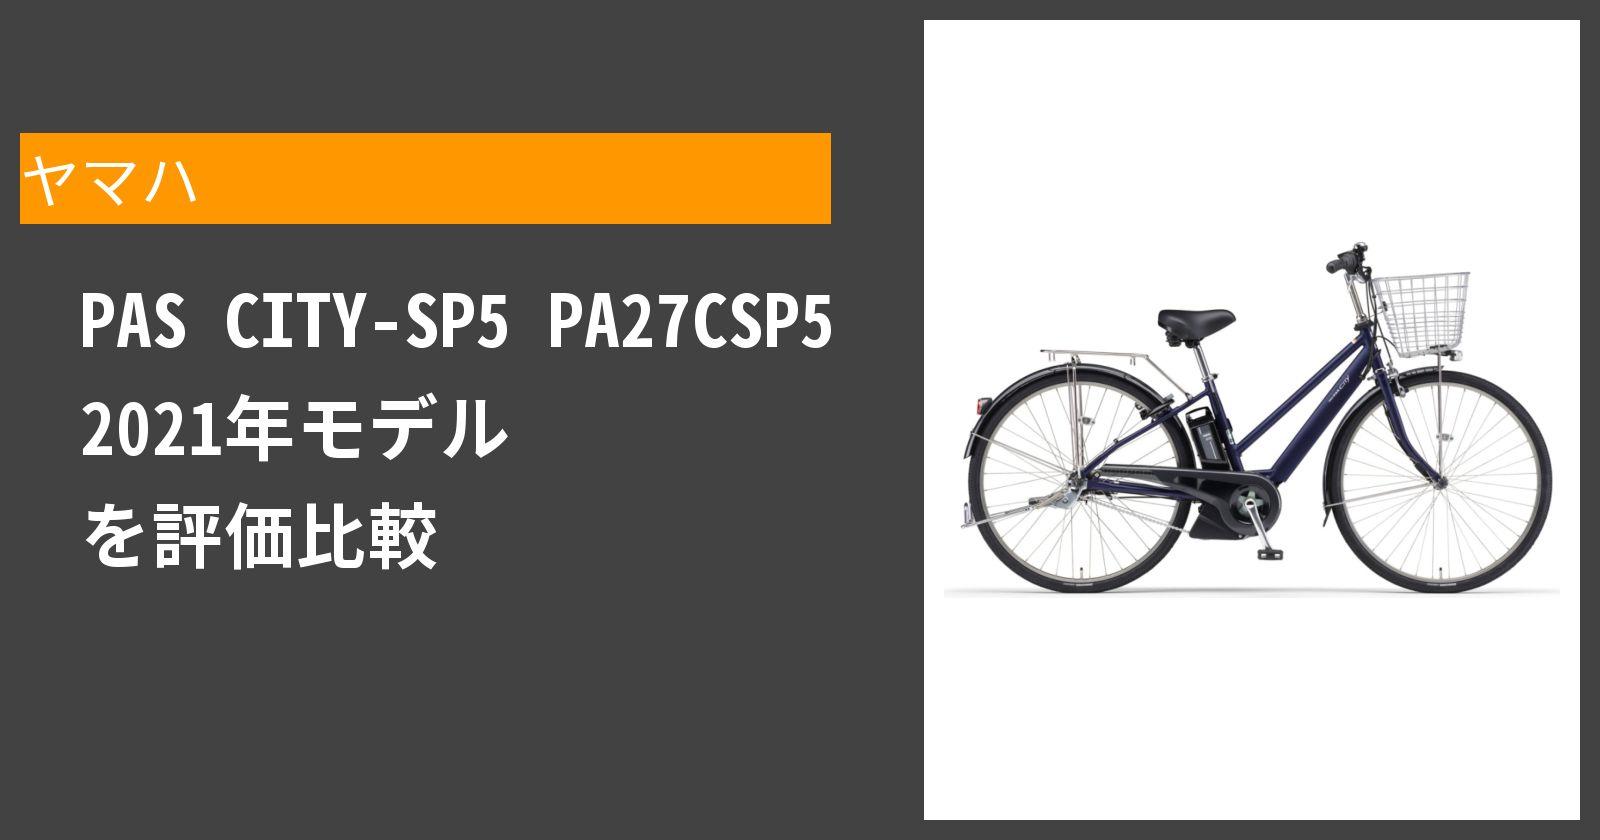 PAS CITY-SP5 PA27CSP5 2021年モデルを徹底評価